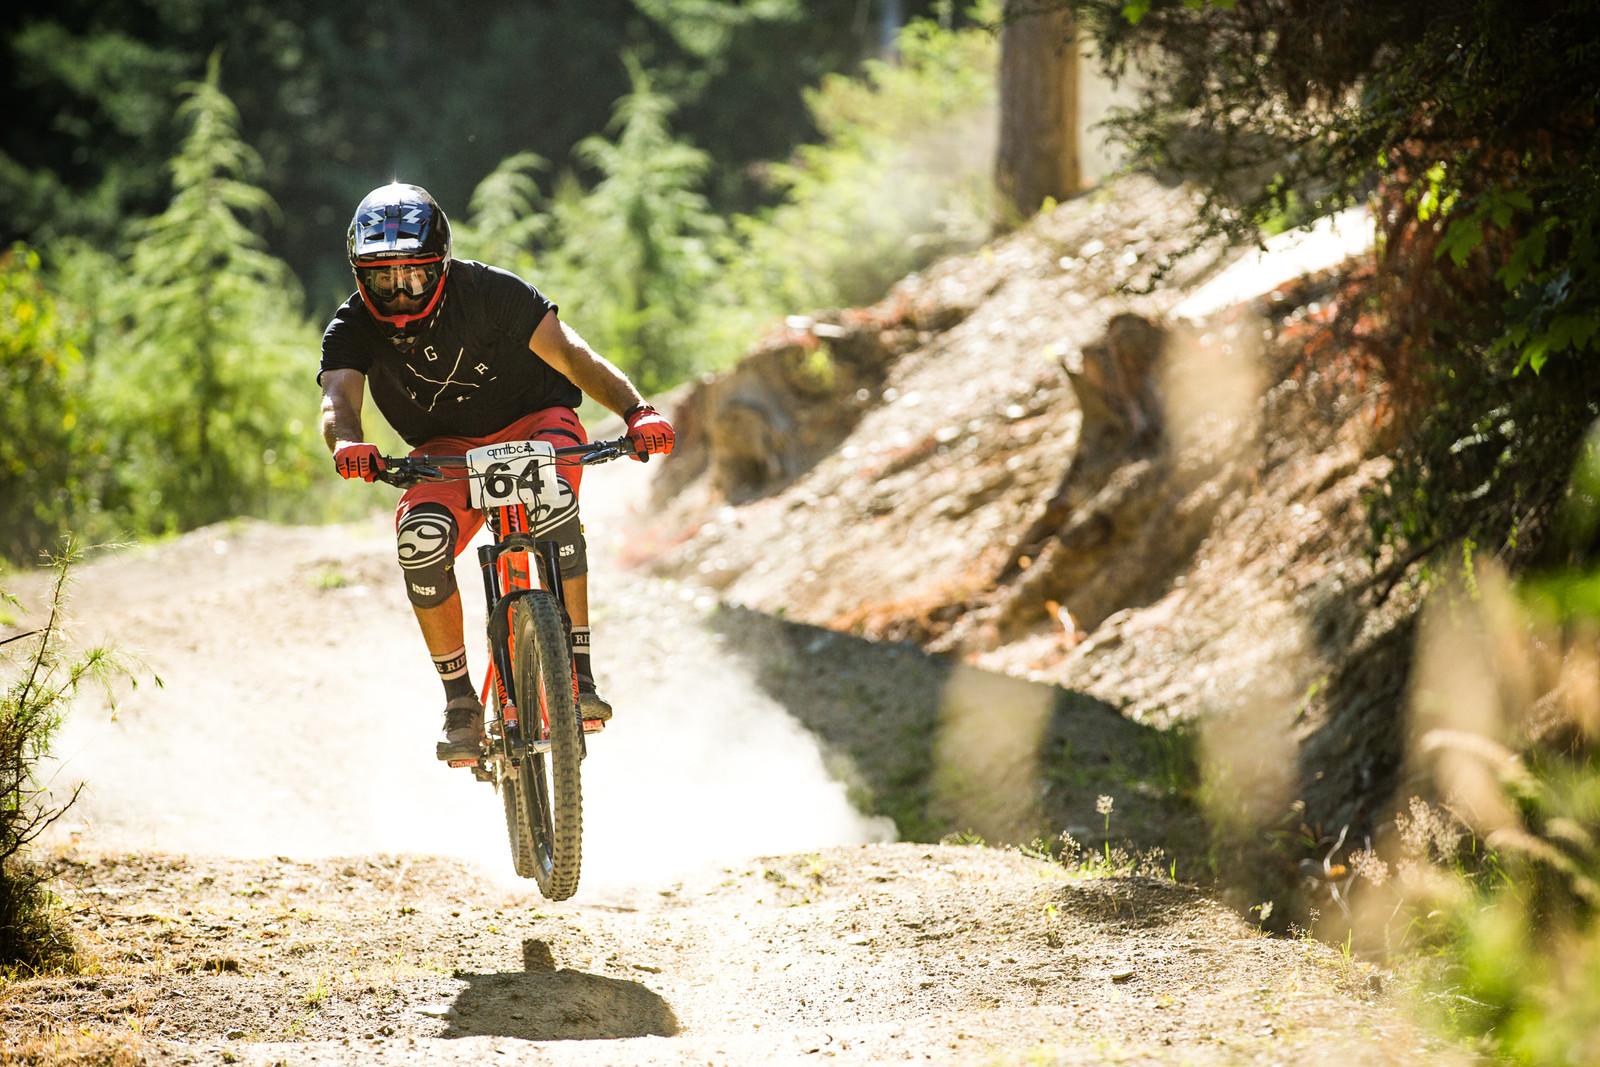 Reece Railing - Homegrown NZ Downhill - Vertigo Bikes Ride More DH Series Race 1 - Mountain Biking Pictures - Vital MTB